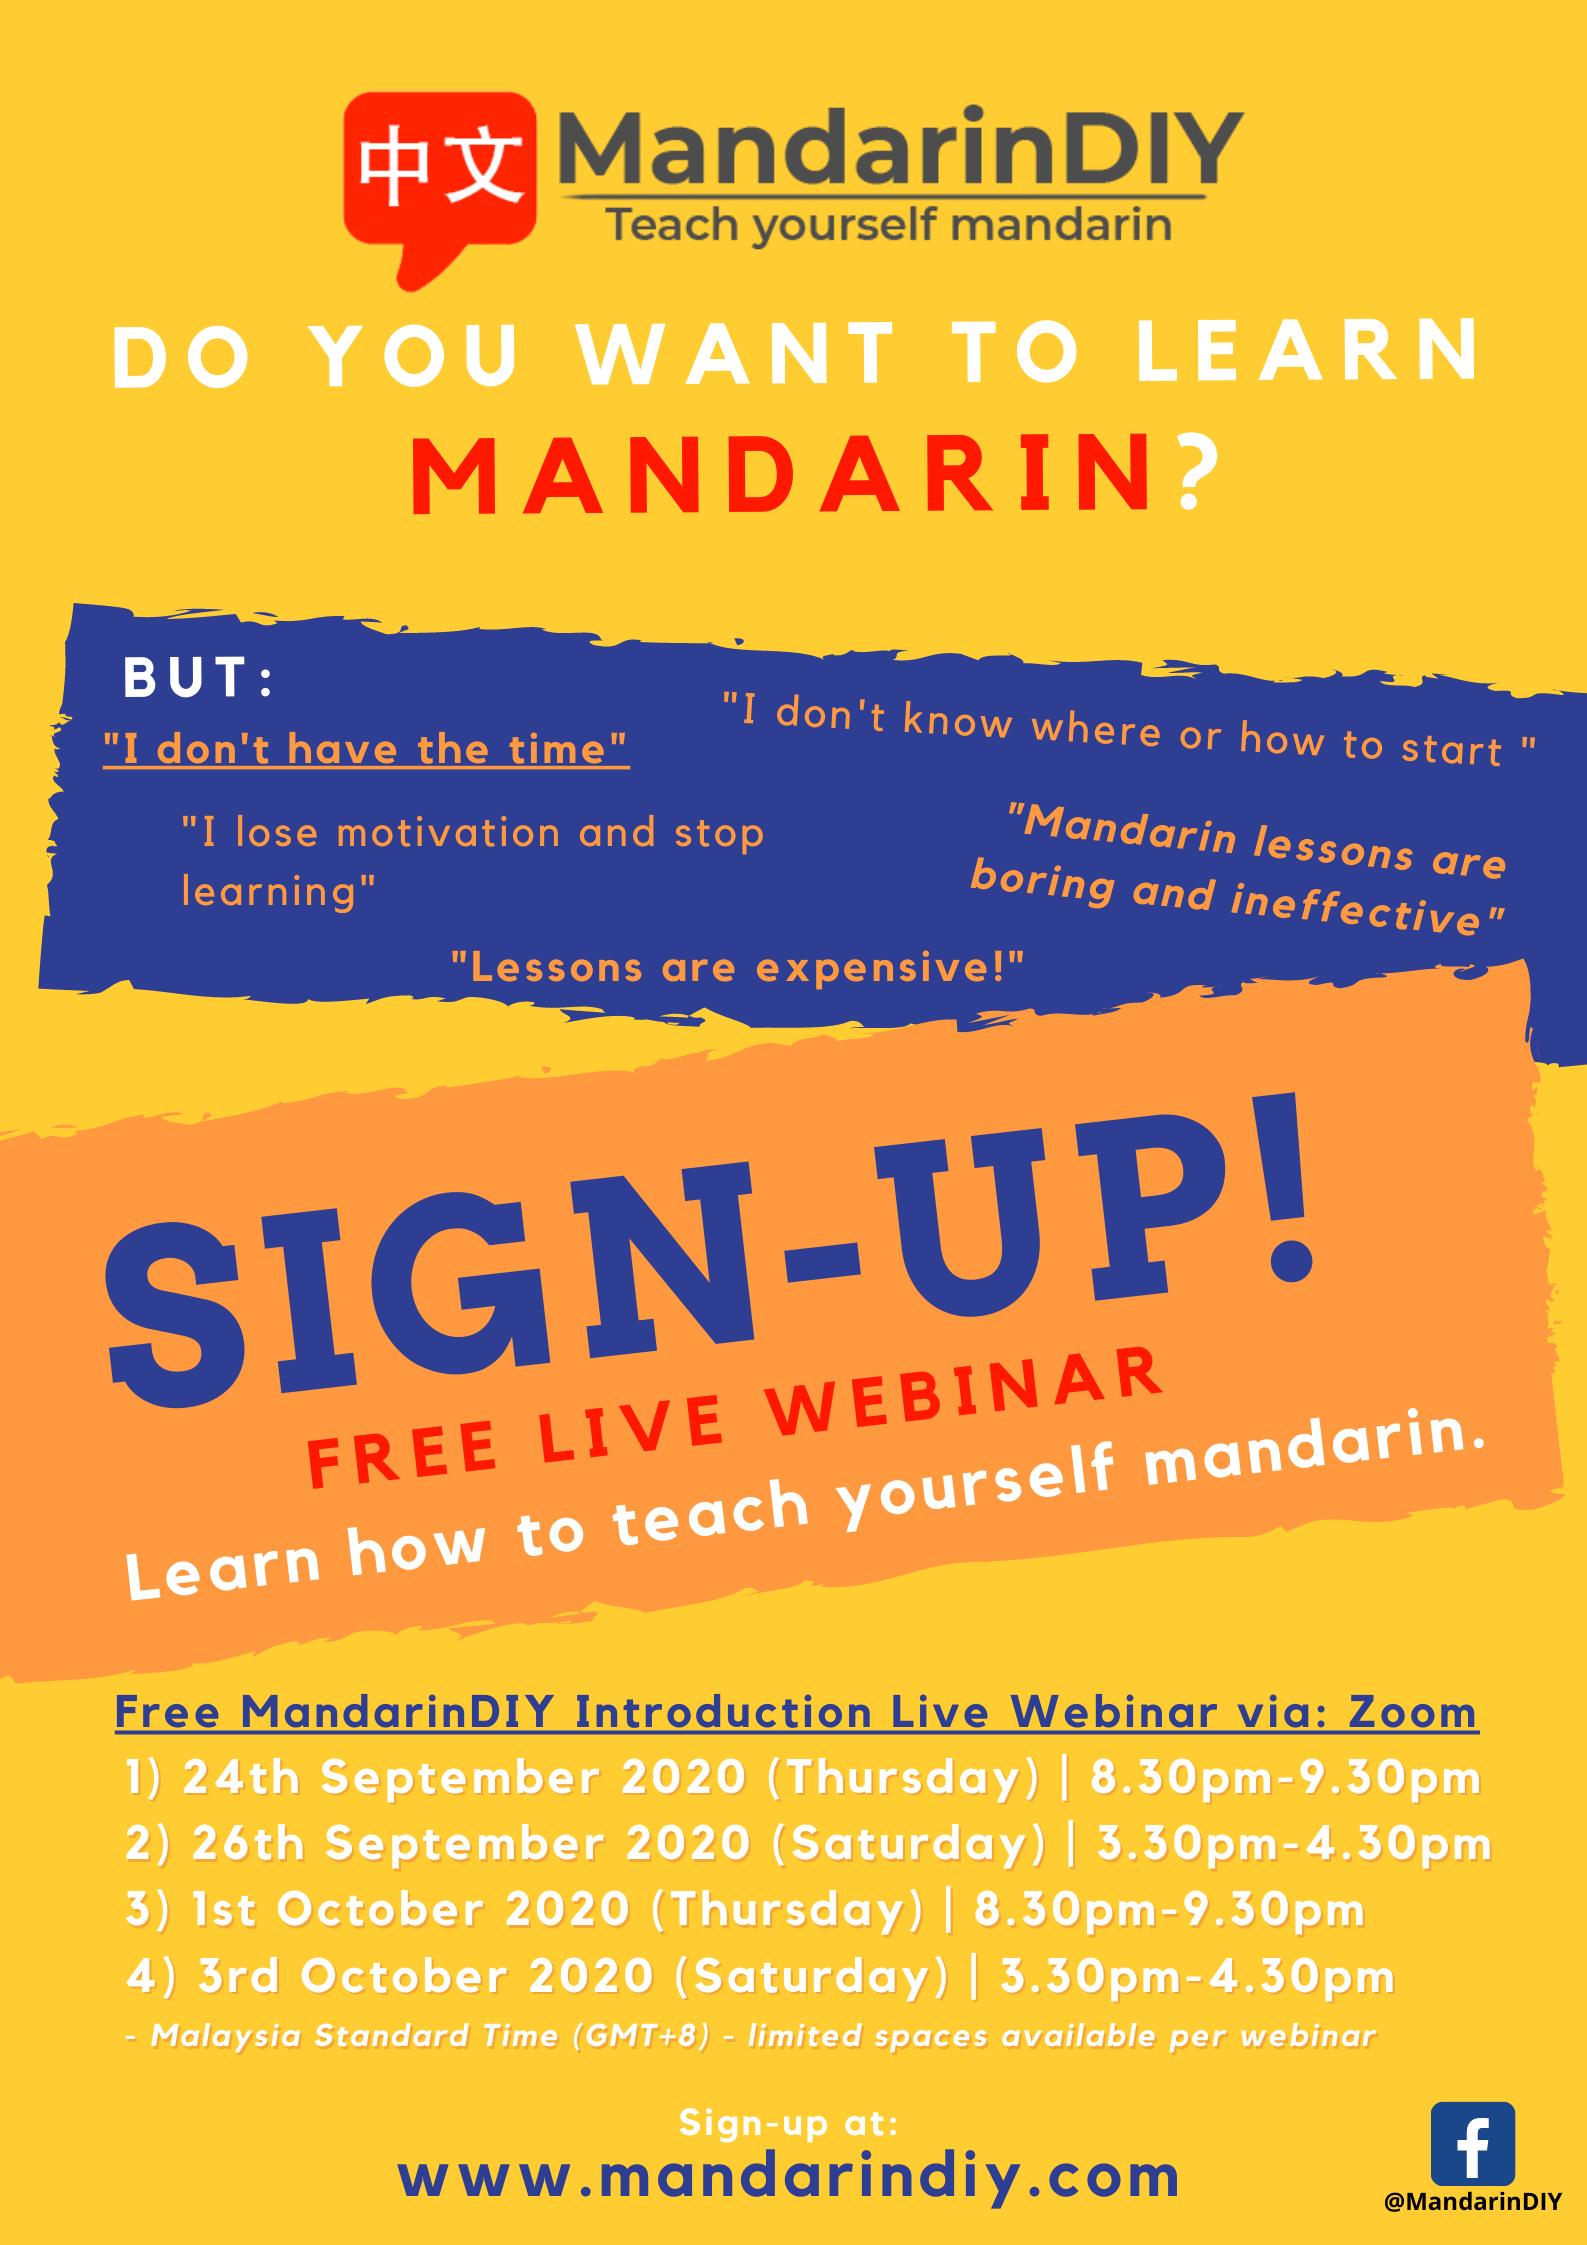 MandarinDIY Introduction Webinar via: Zoom <br>(Please select one webinar)